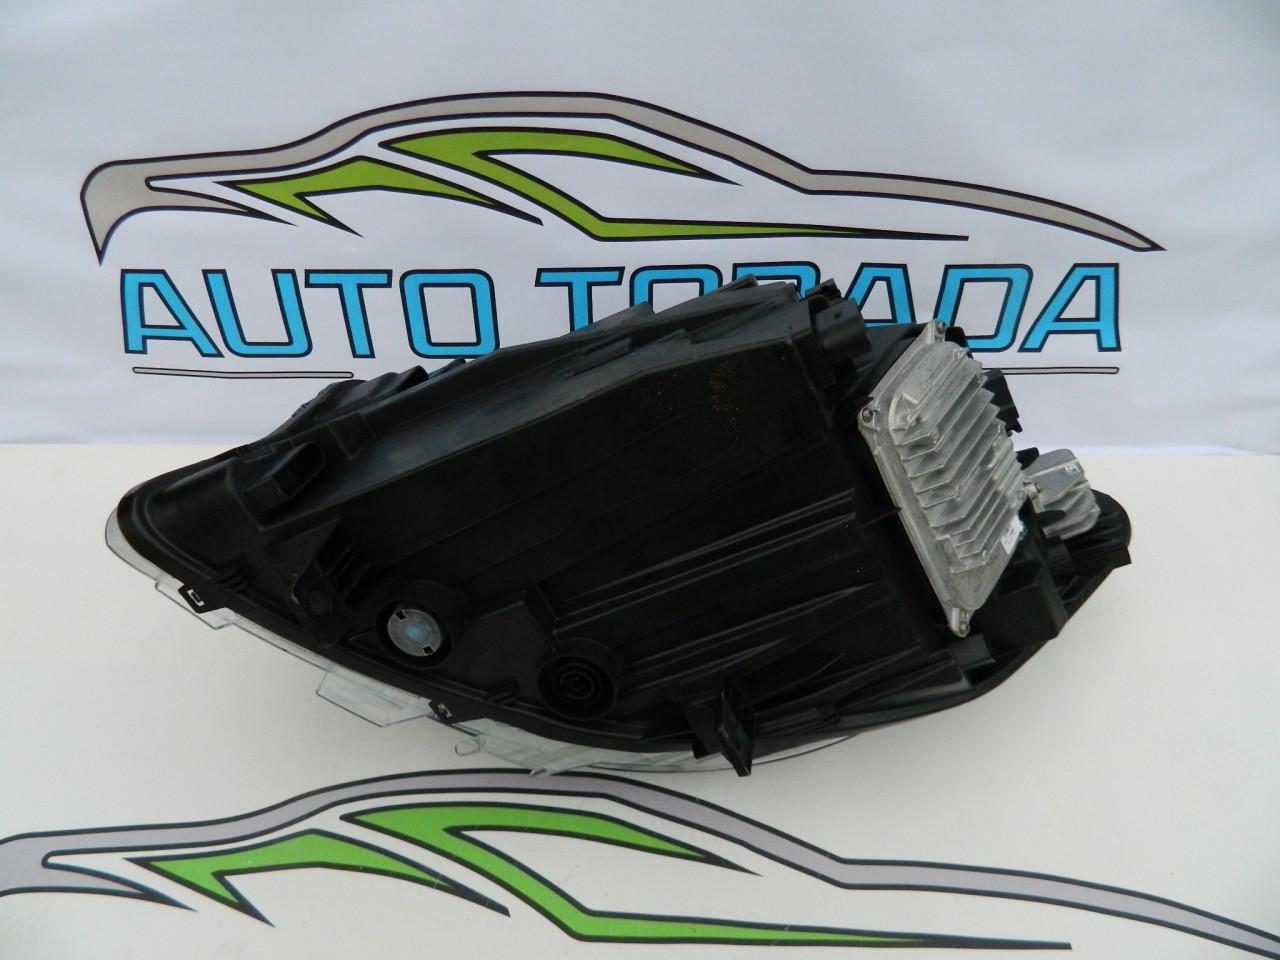 Far stanga dreapta Full Led Mercedes Sprinter W910 model 2019 cod A9109065000,A9109065100